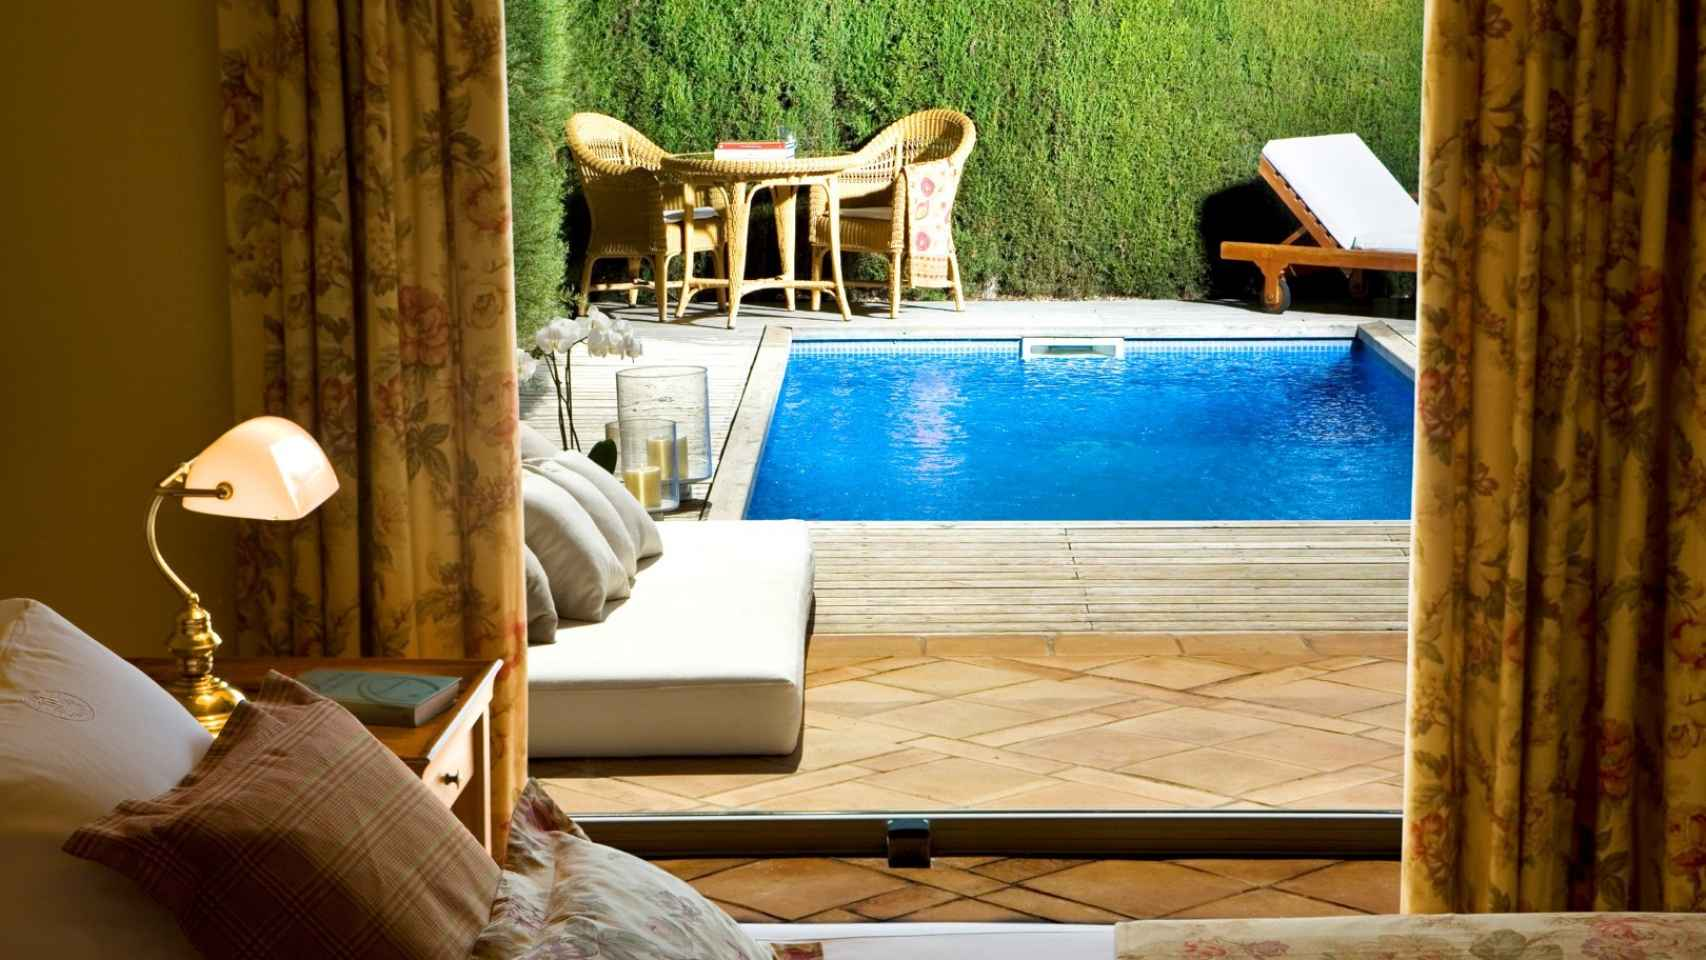 No molesten por favor habitaci n con piscina privada for Piscina isla leon